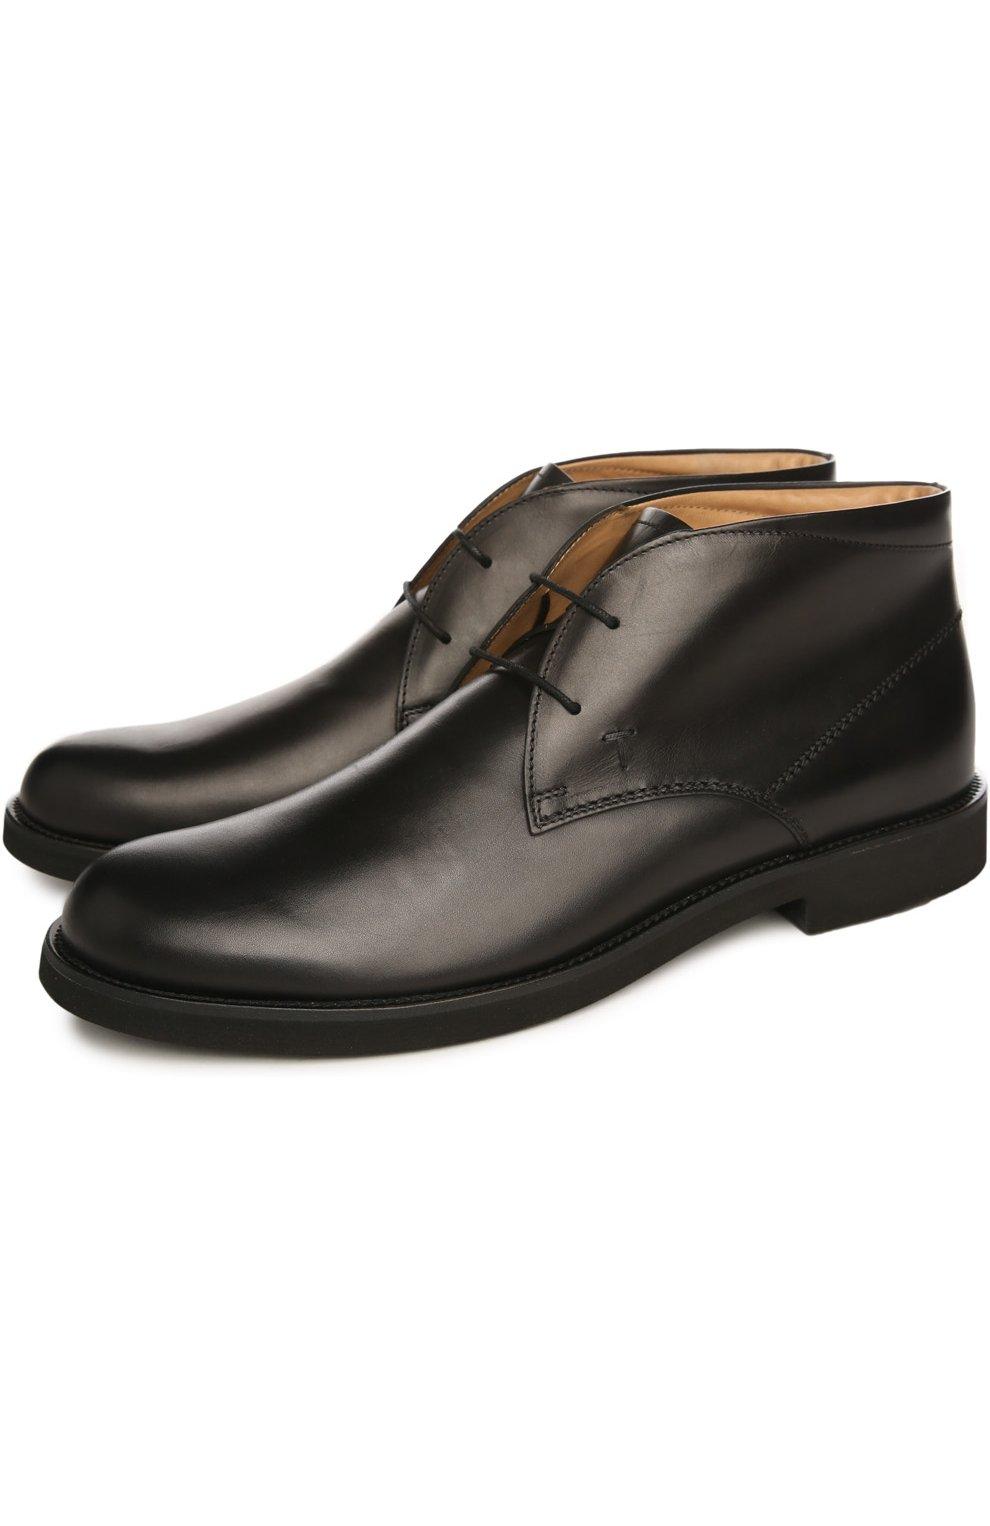 Кожаные ботинки Gomma   Фото №2